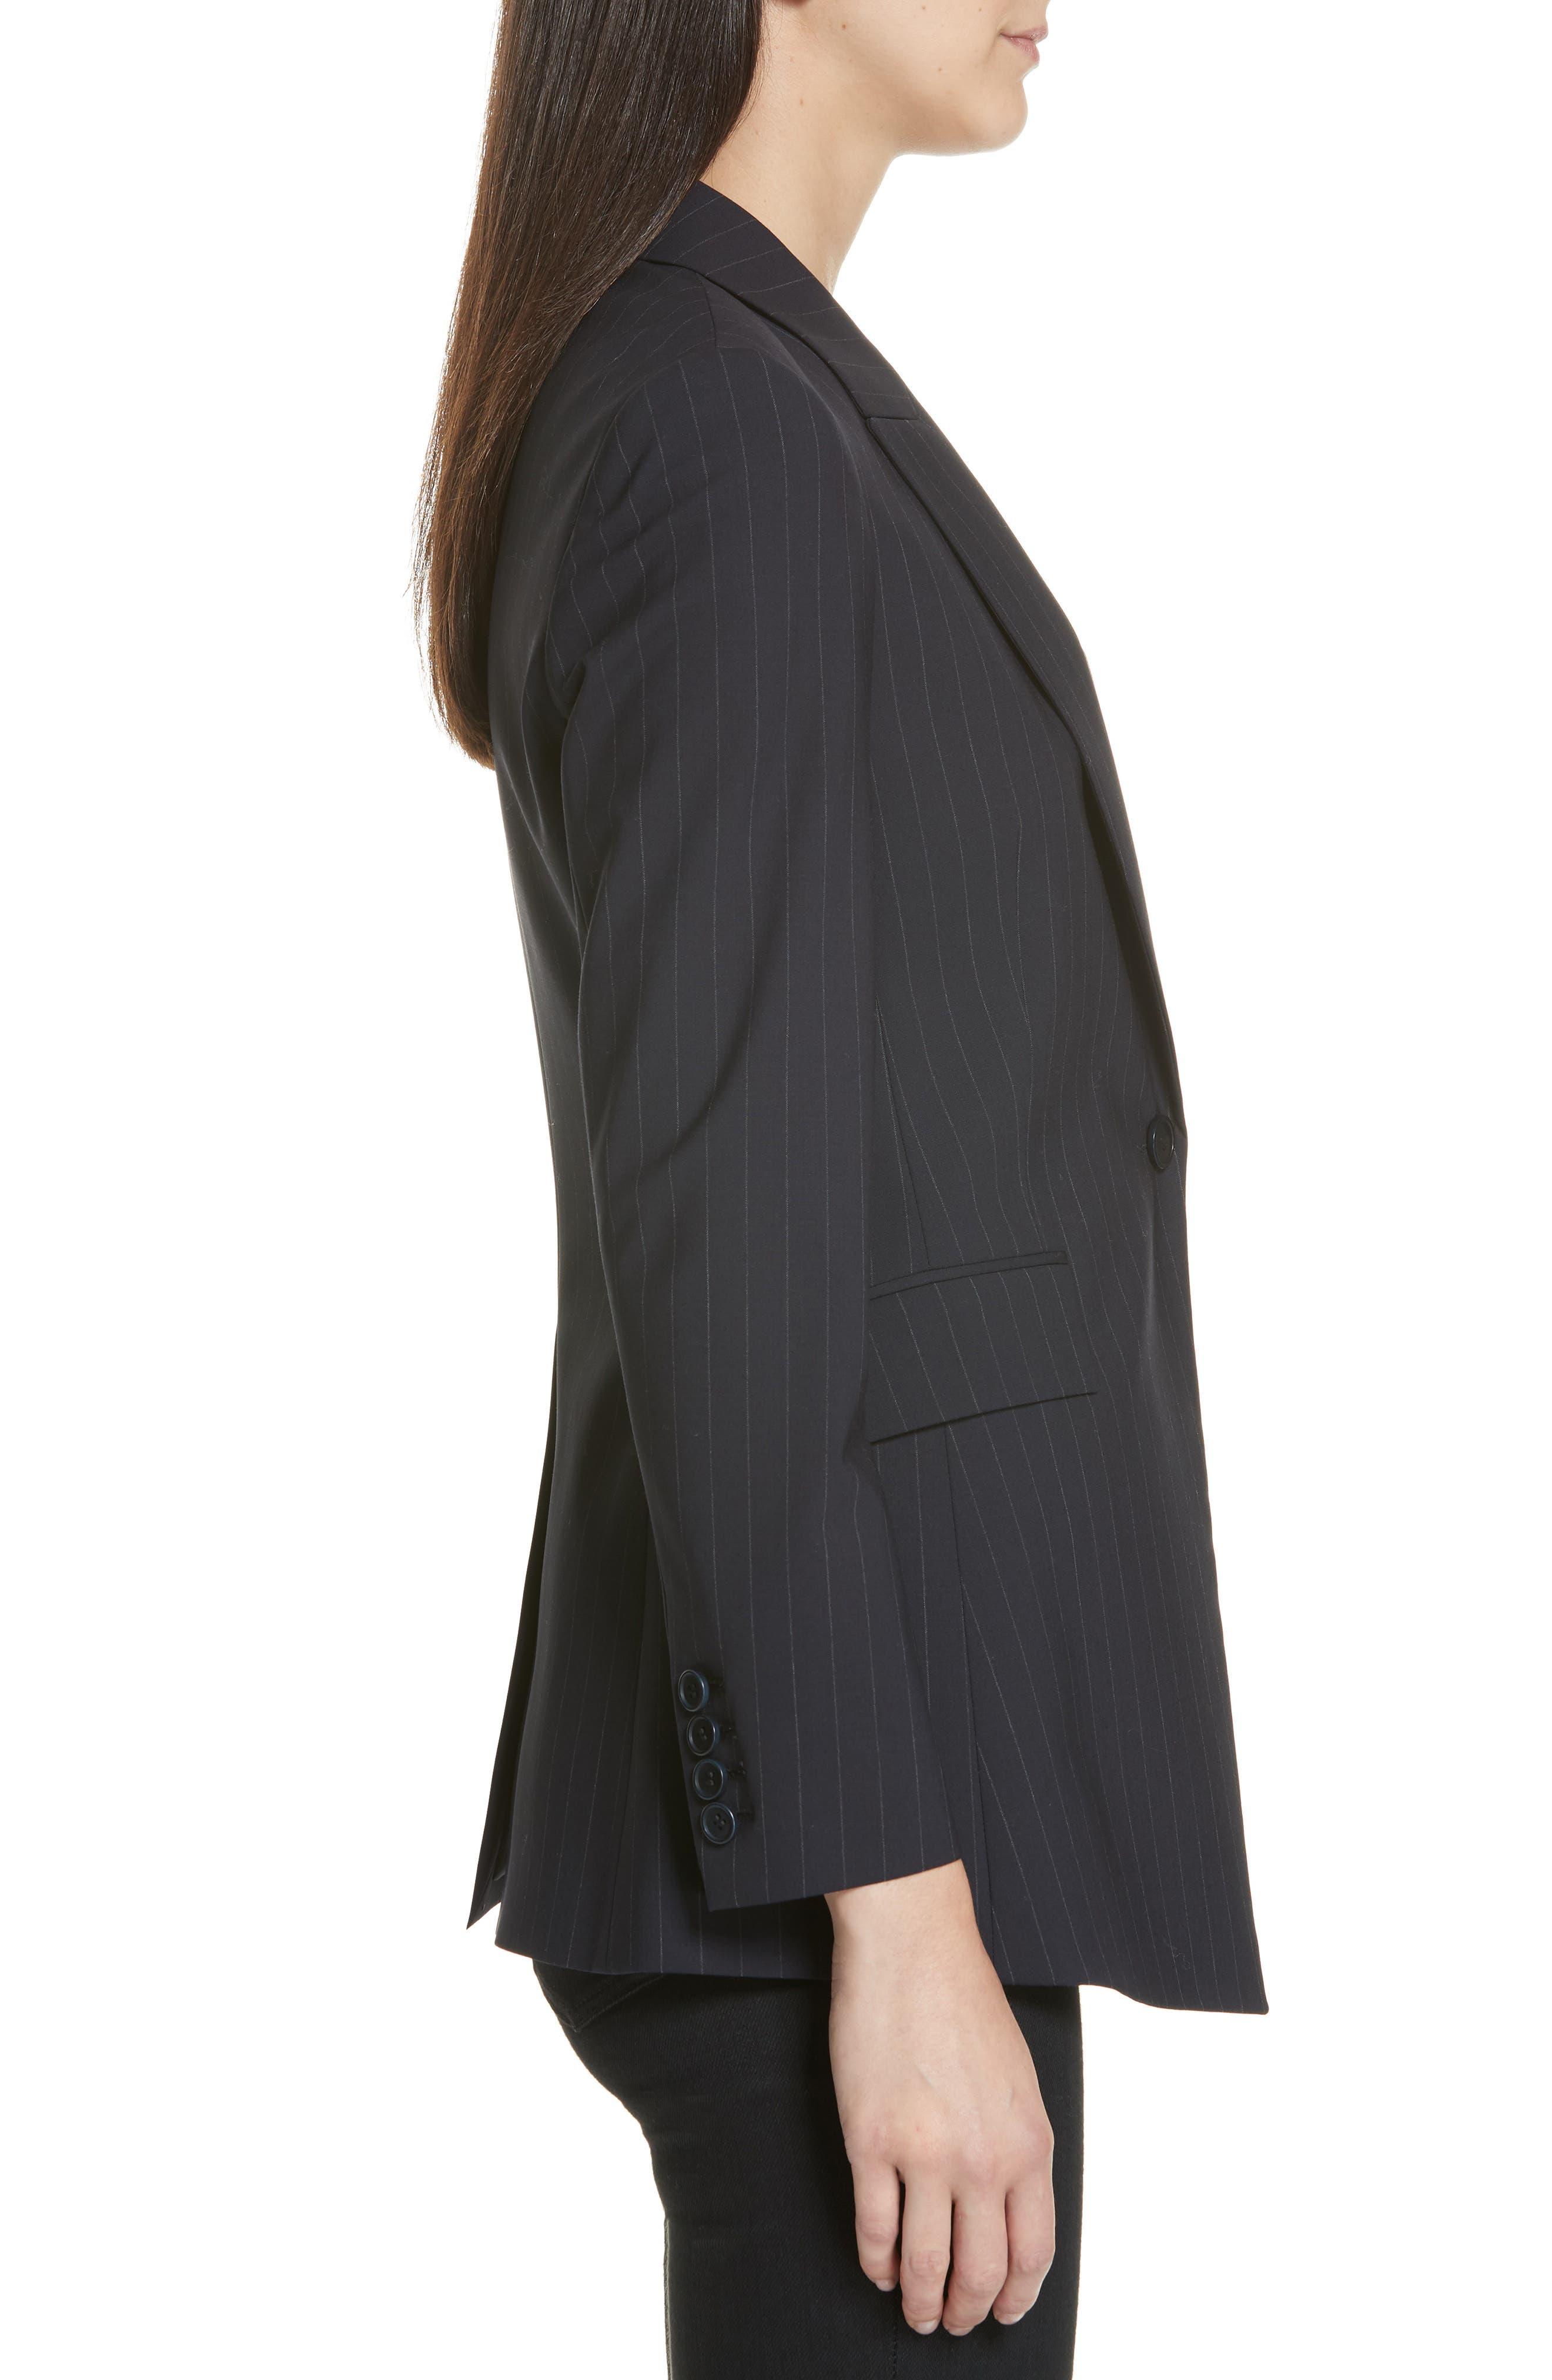 Etienette B Good Wool Suit Jacket,                             Alternate thumbnail 19, color,